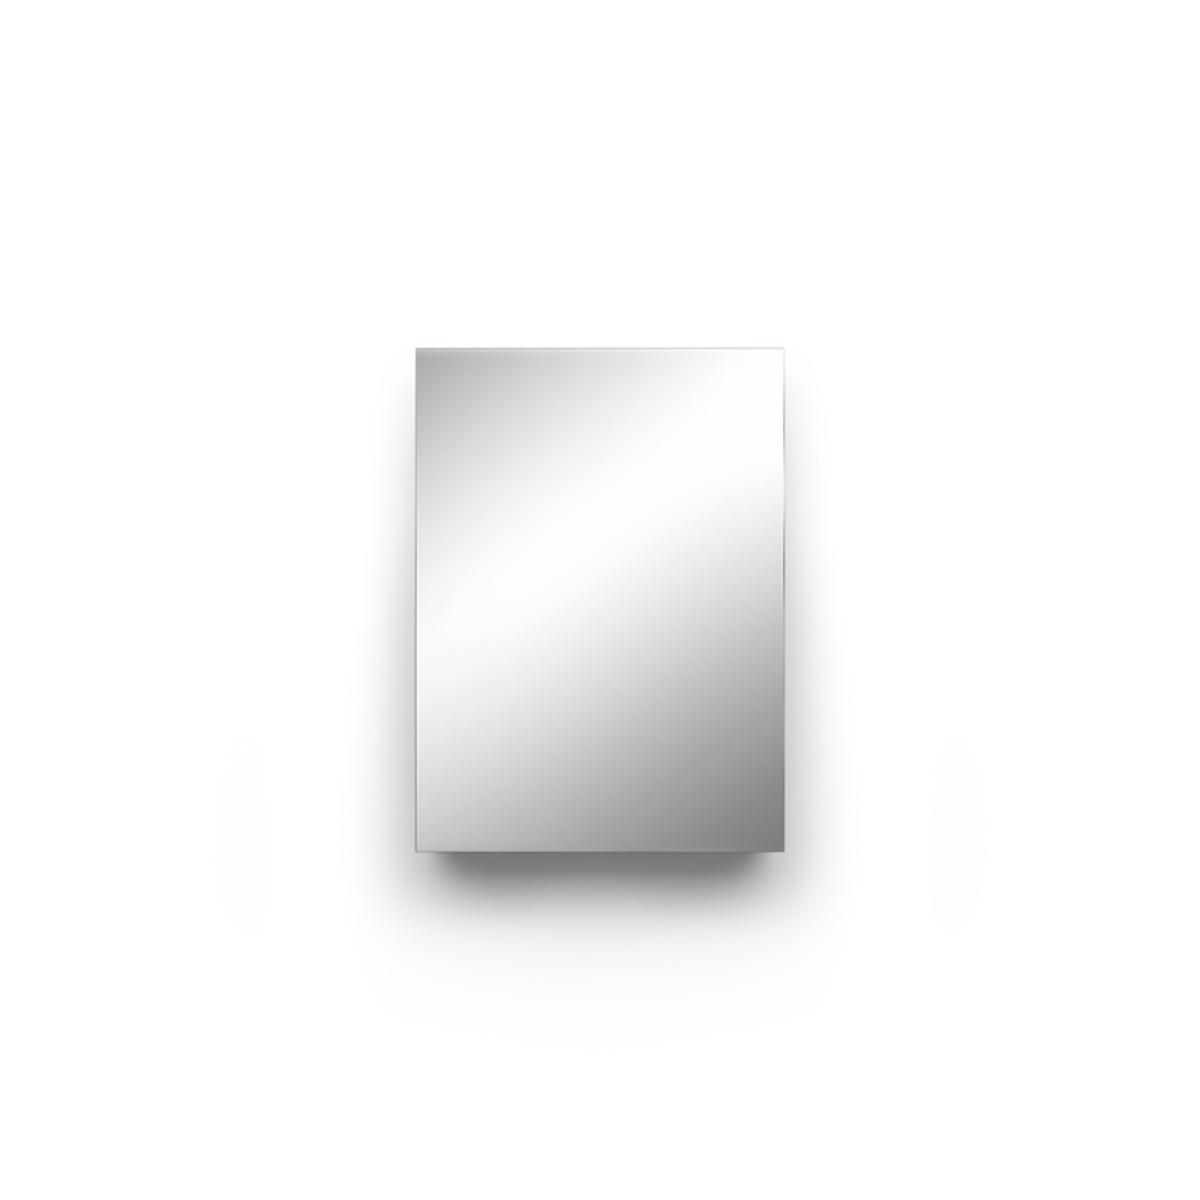 Badezimmer Spiegelschrank 90 Cm spiegelschrank fackelmann vadea - badezimmer 90 cm